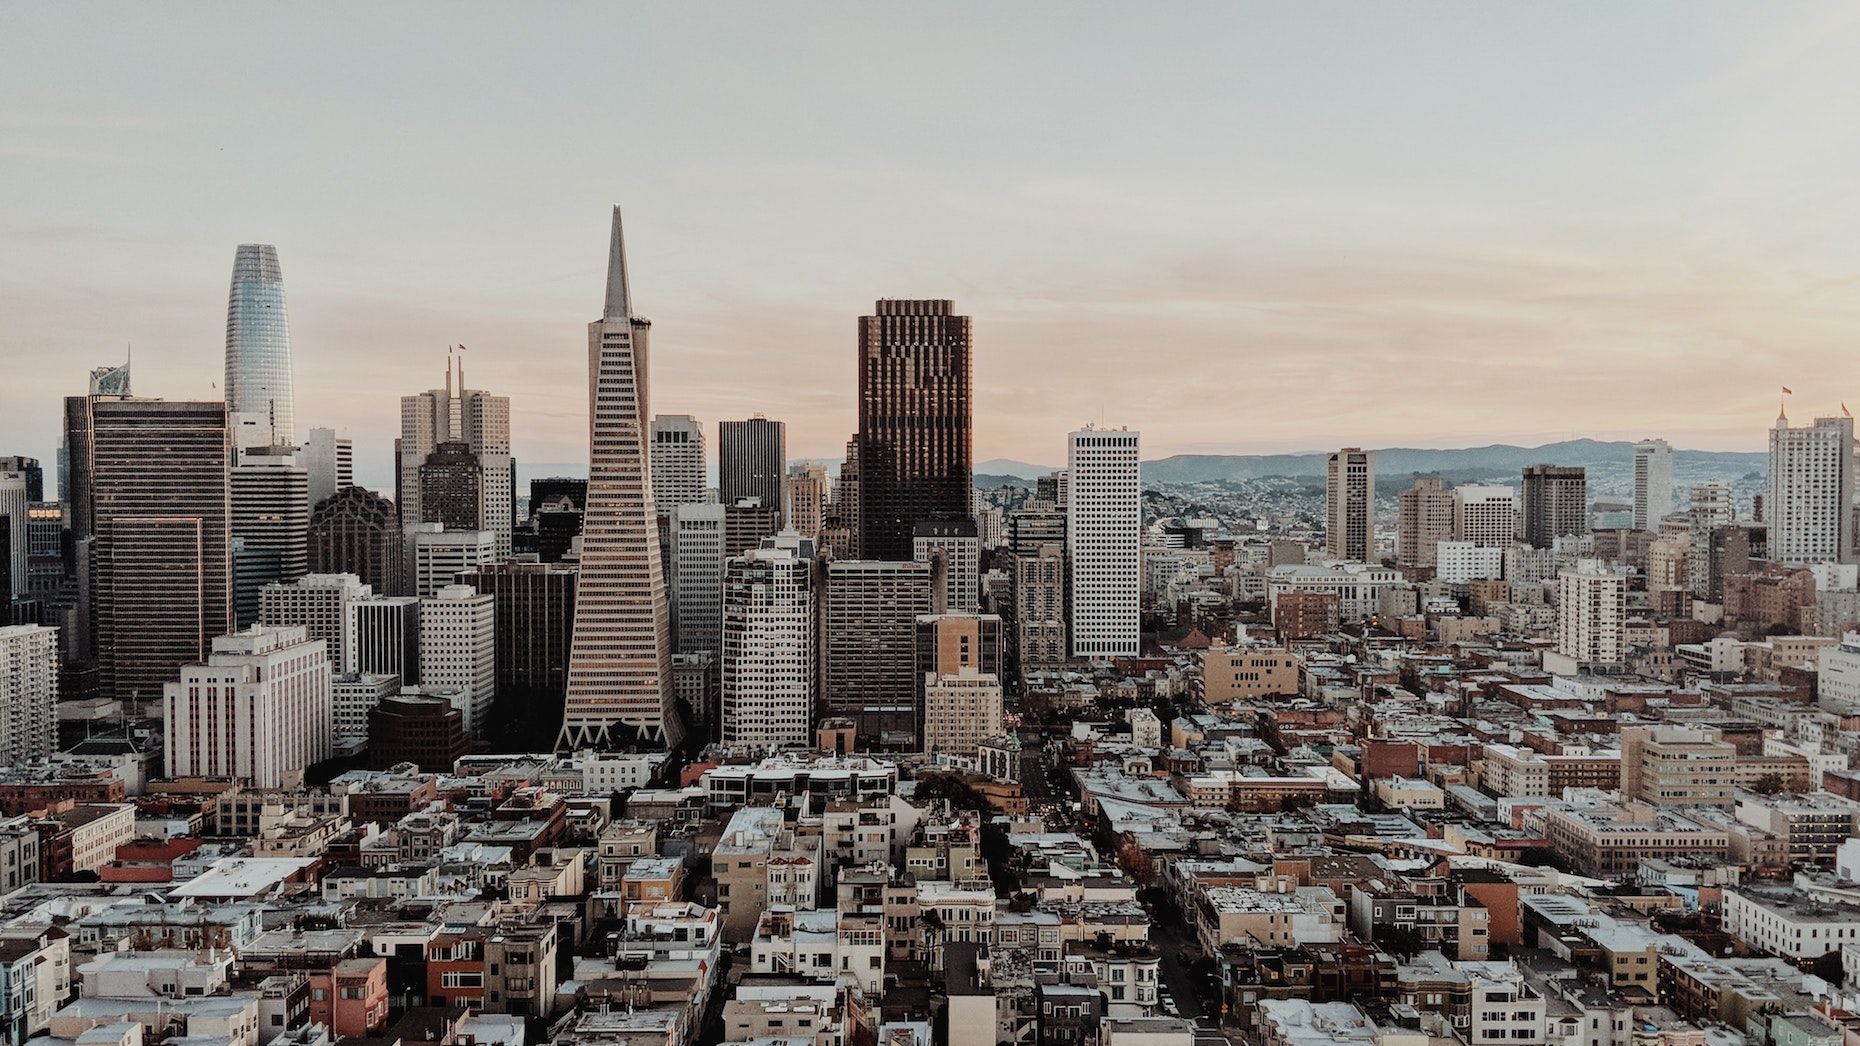 Expensive U.S. cities see rents fall amid coronavirus pandemic